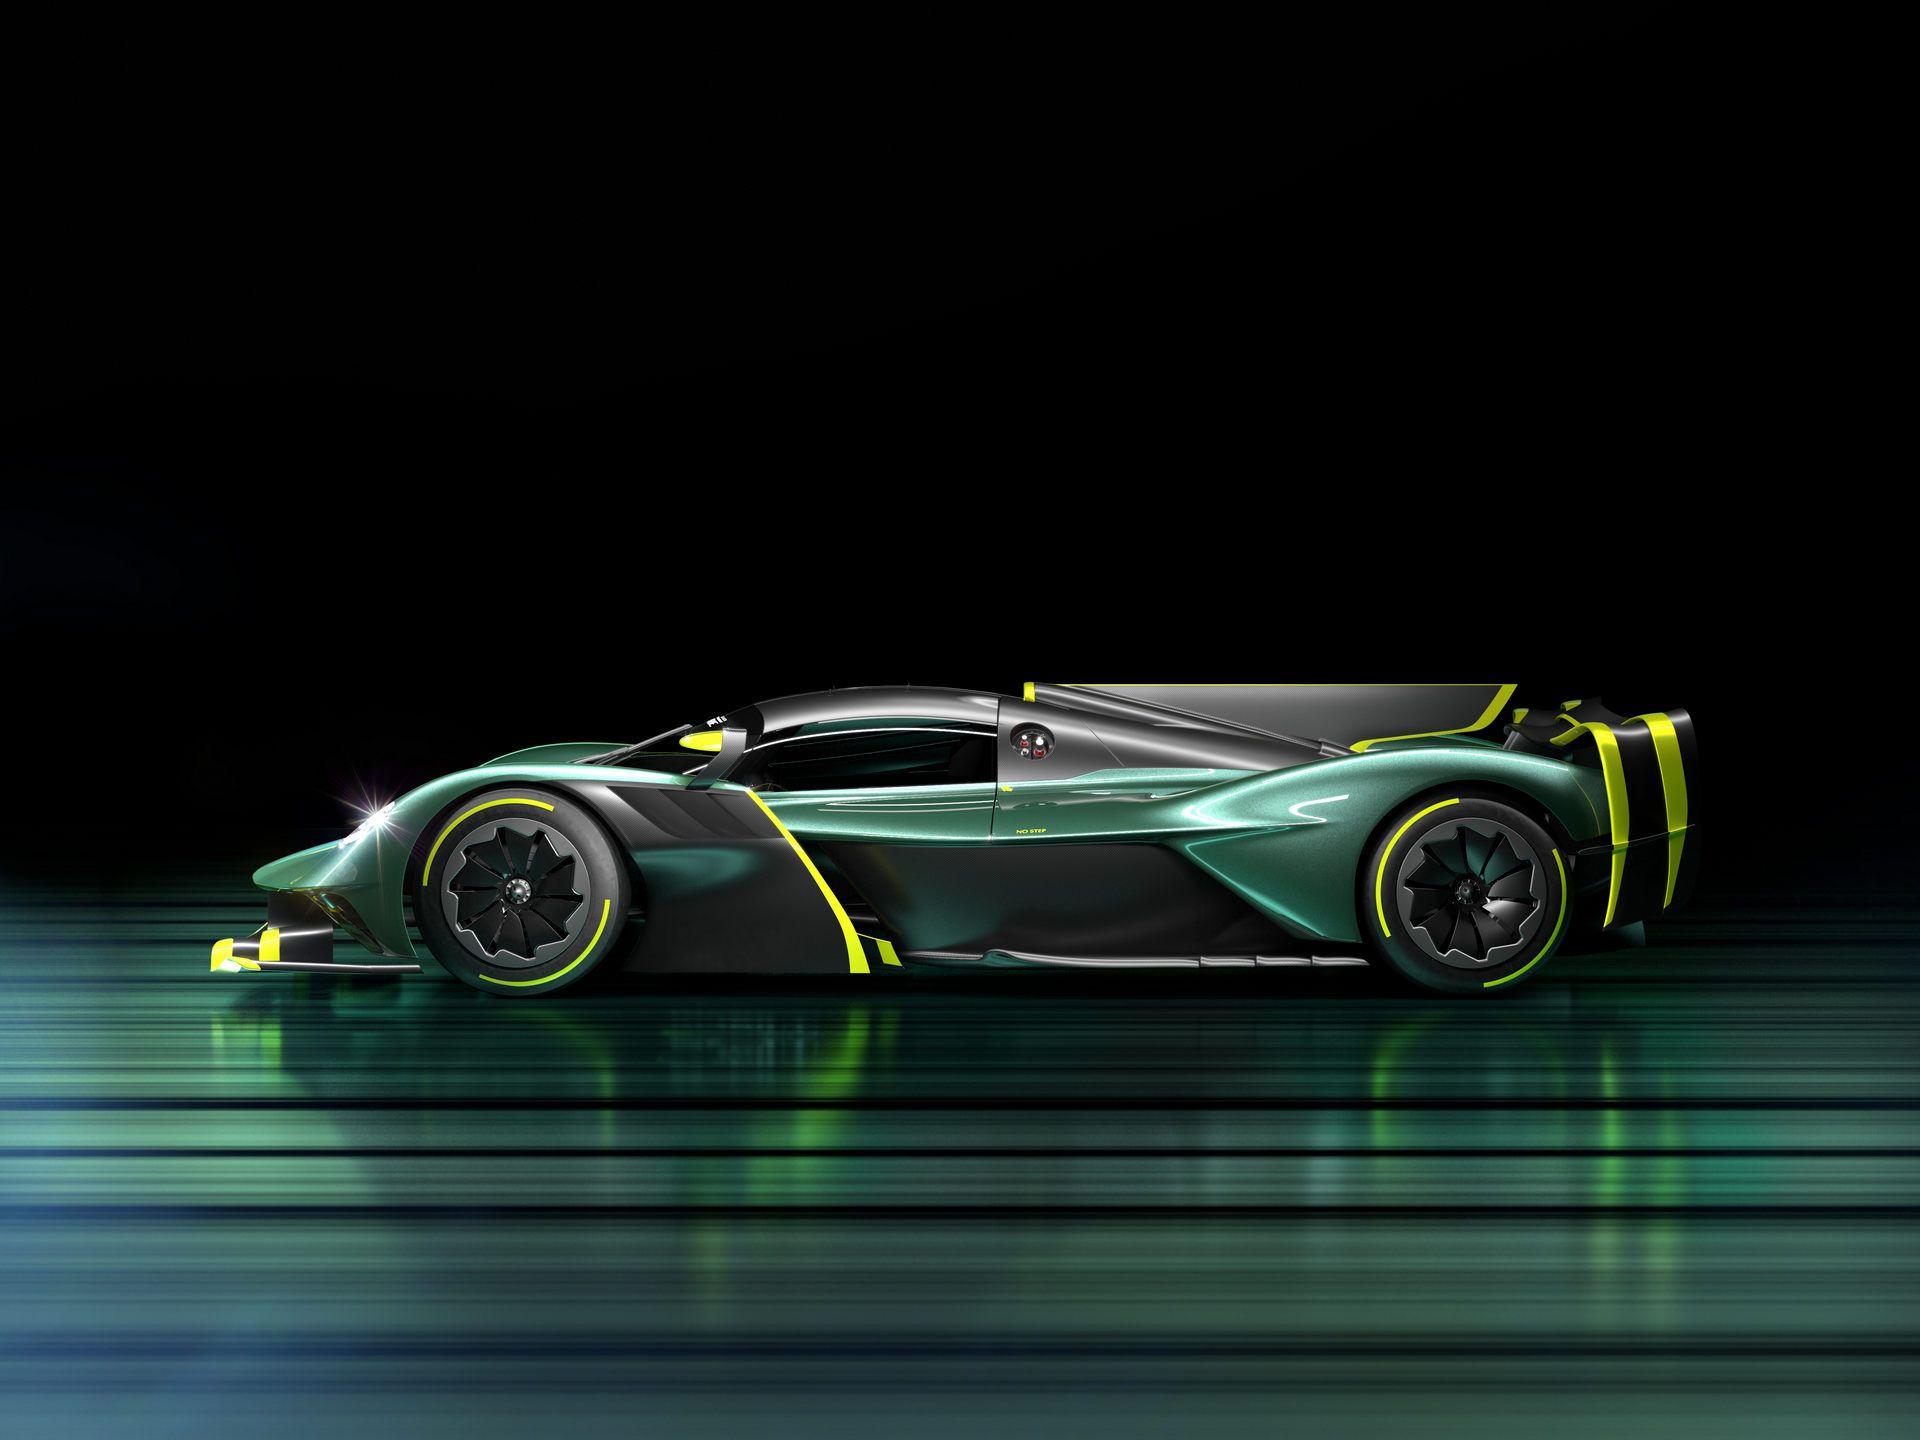 Aston-Martin-Valkyrie-AMR-Pro-production-version-7